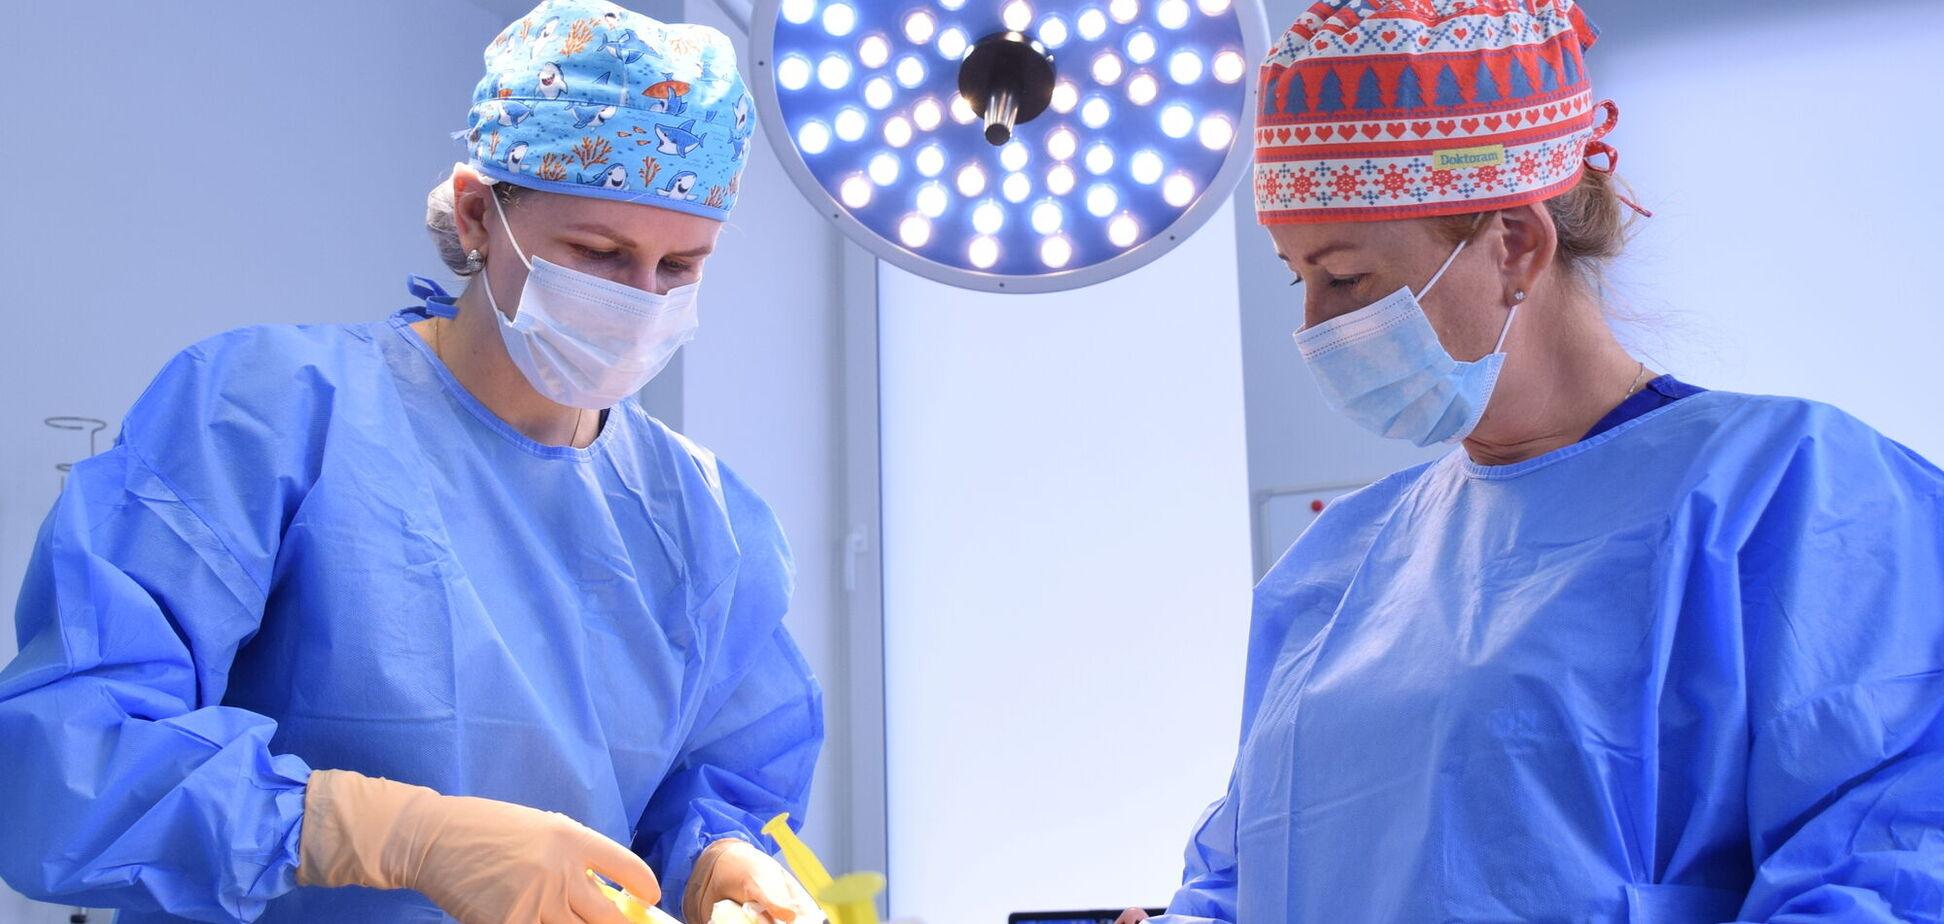 Уколы красоты: советы пластического хирурга